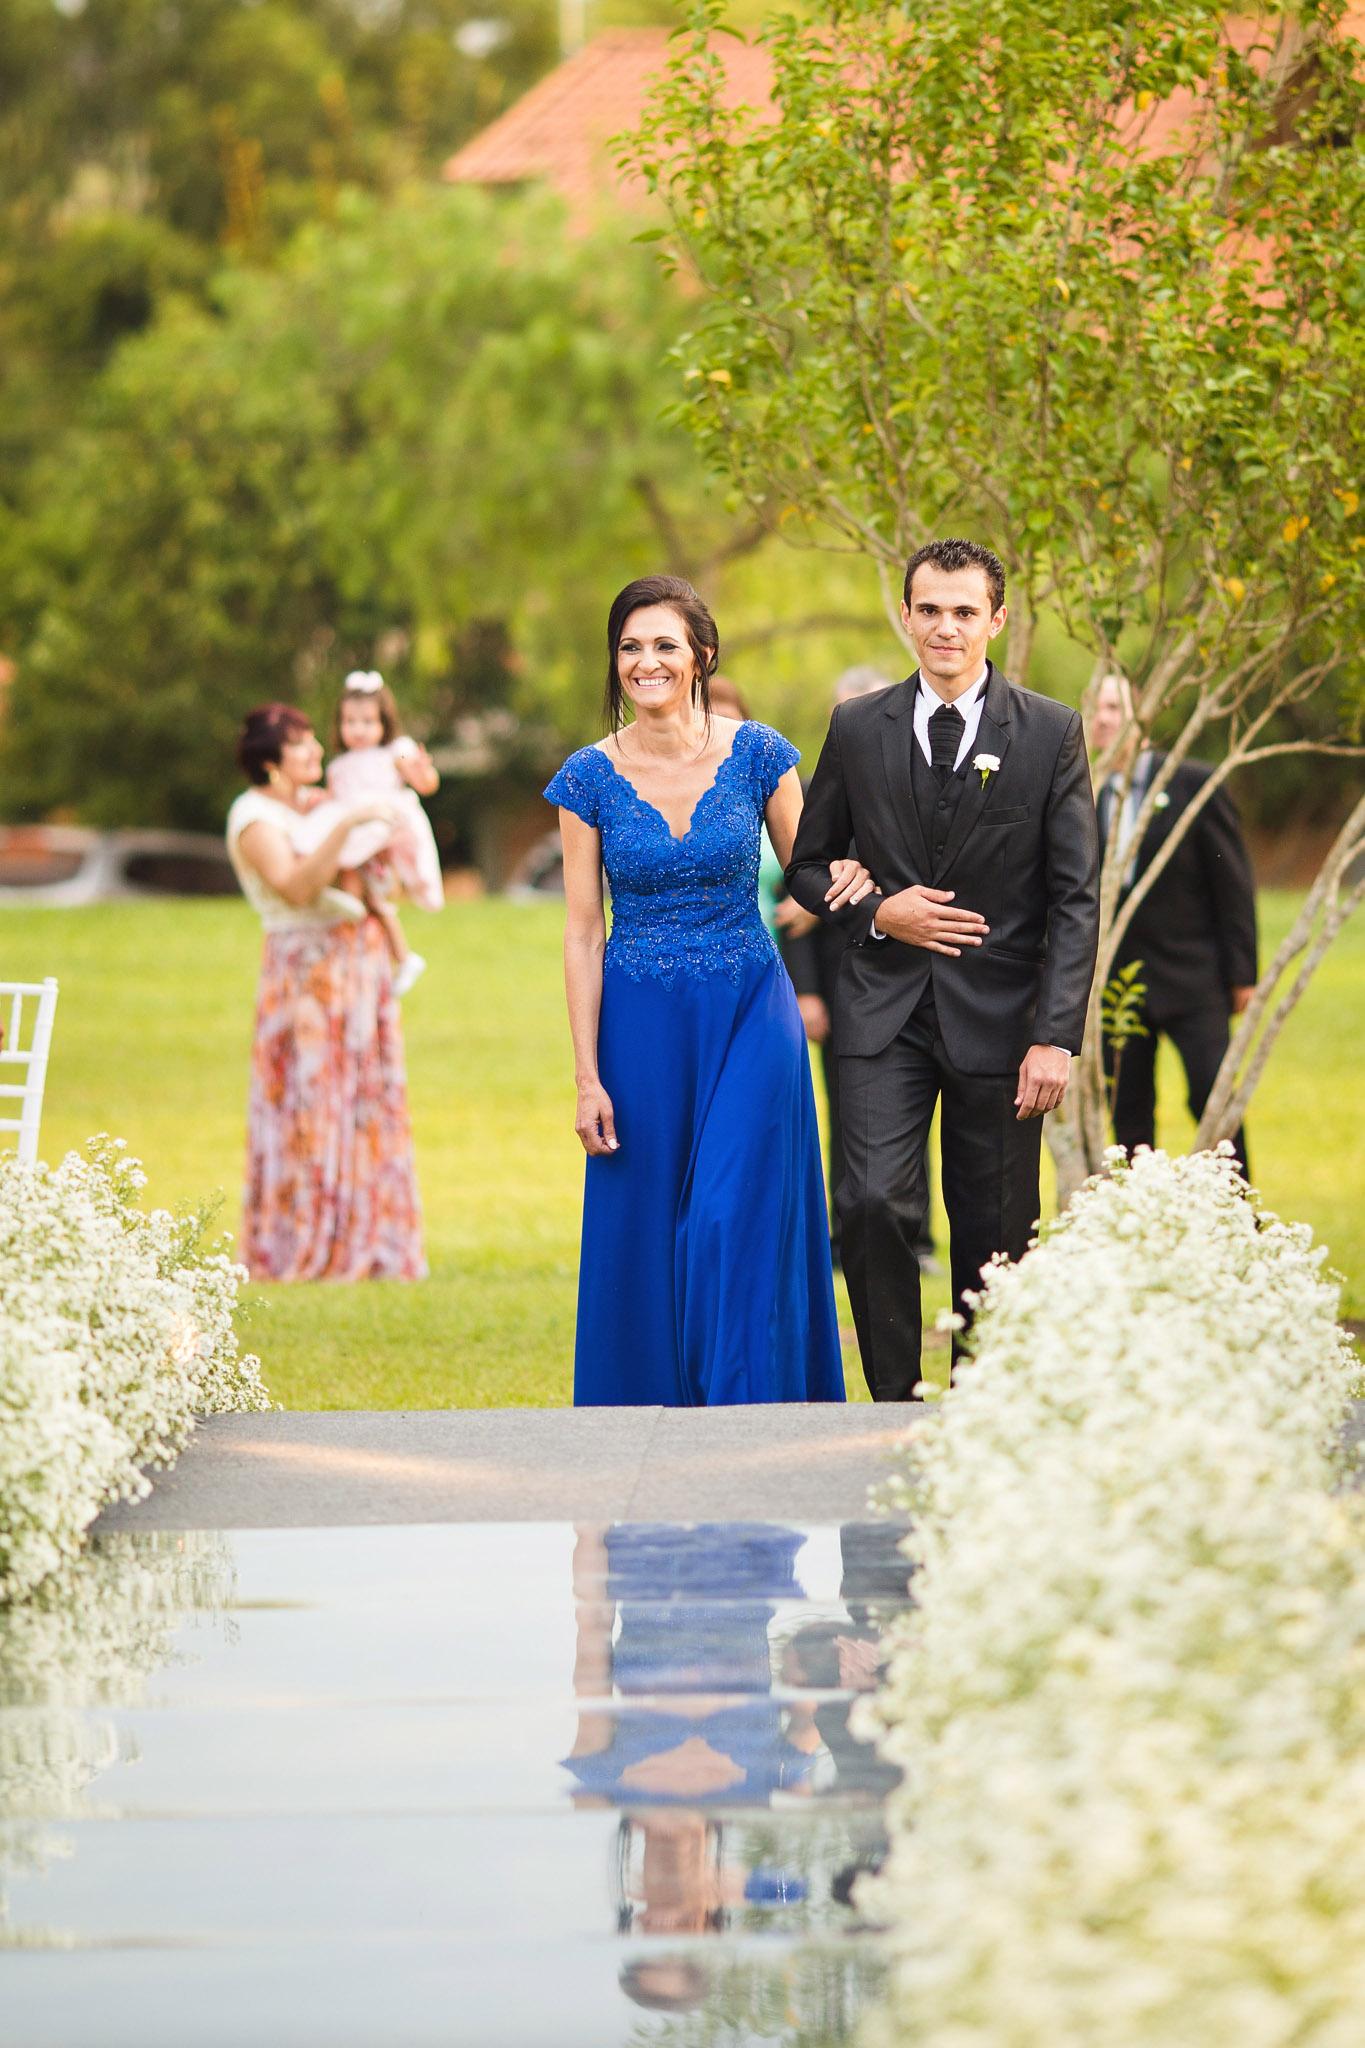 Wedding_Travellers_Destination_Wedding_Photography-30.jpg